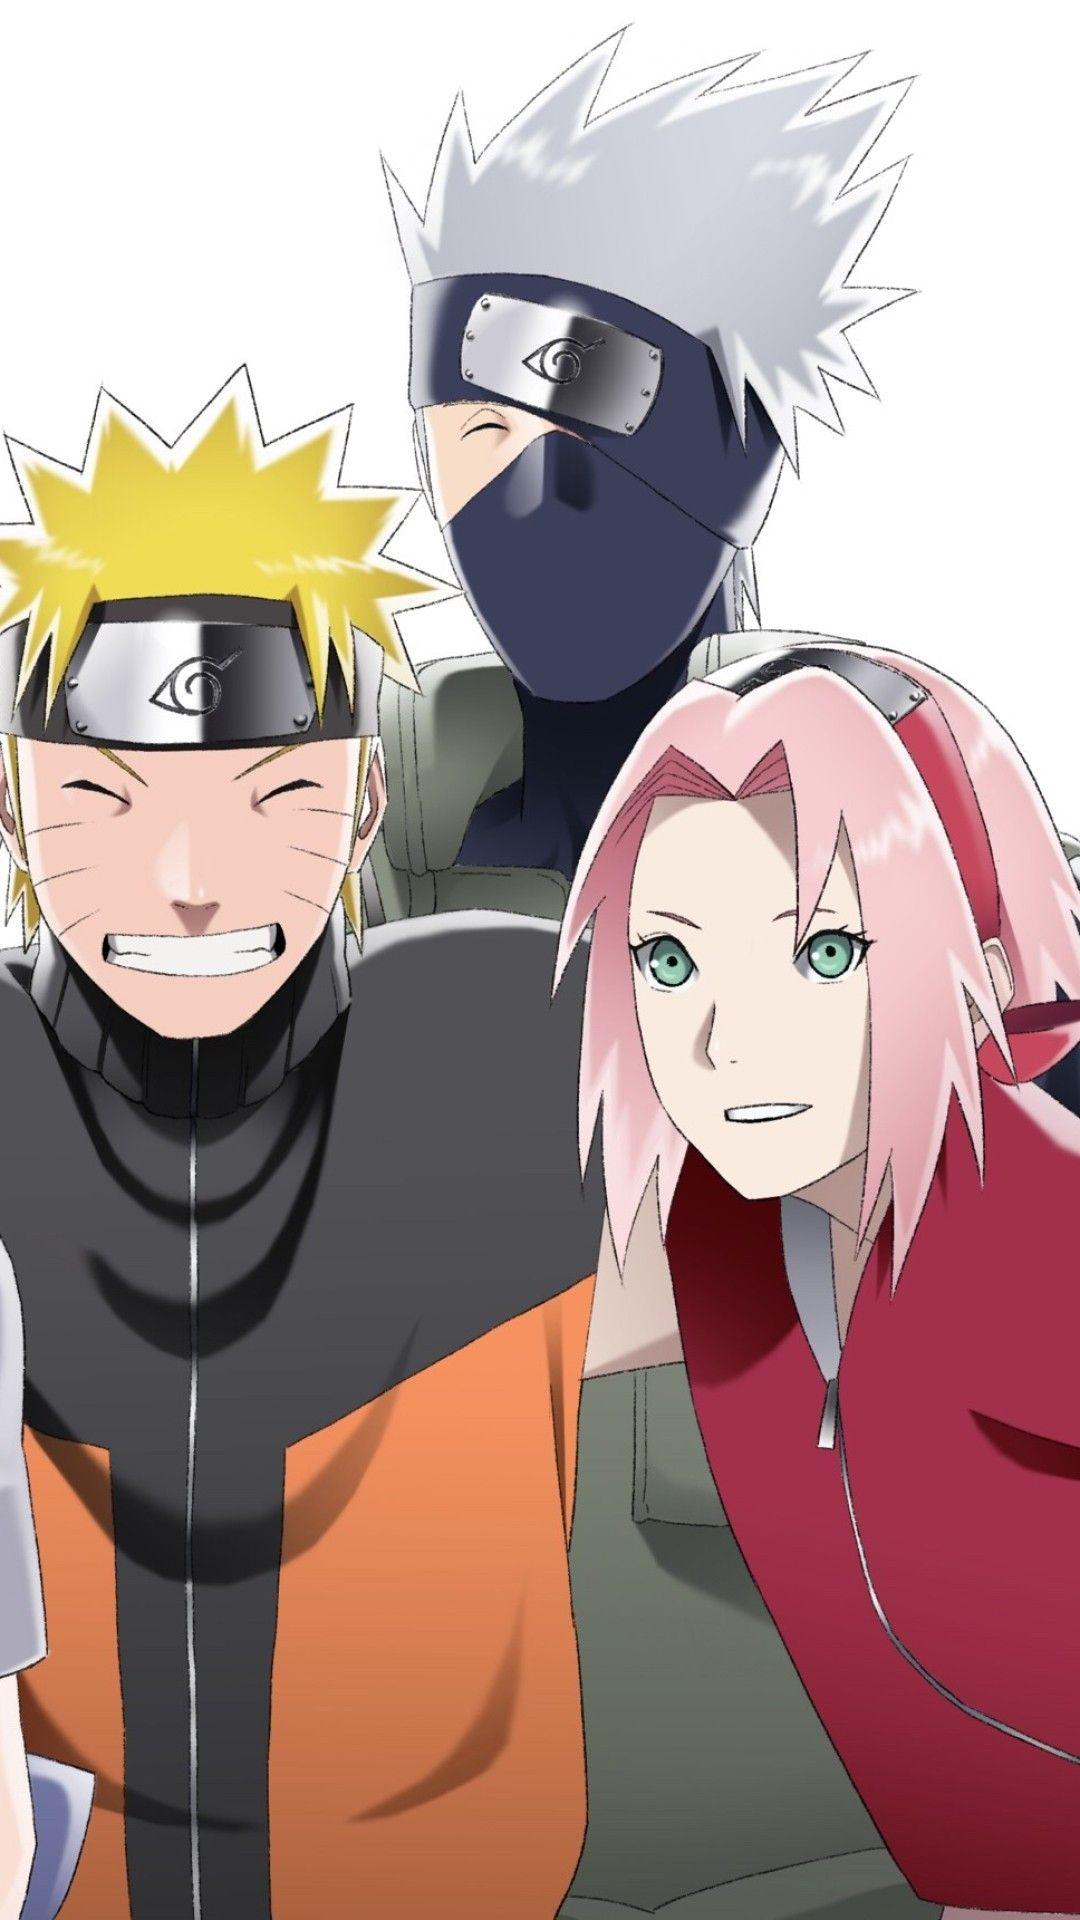 Wallpaper Phone Naruto Sakura And Kakashi Full Hd Com Imagens